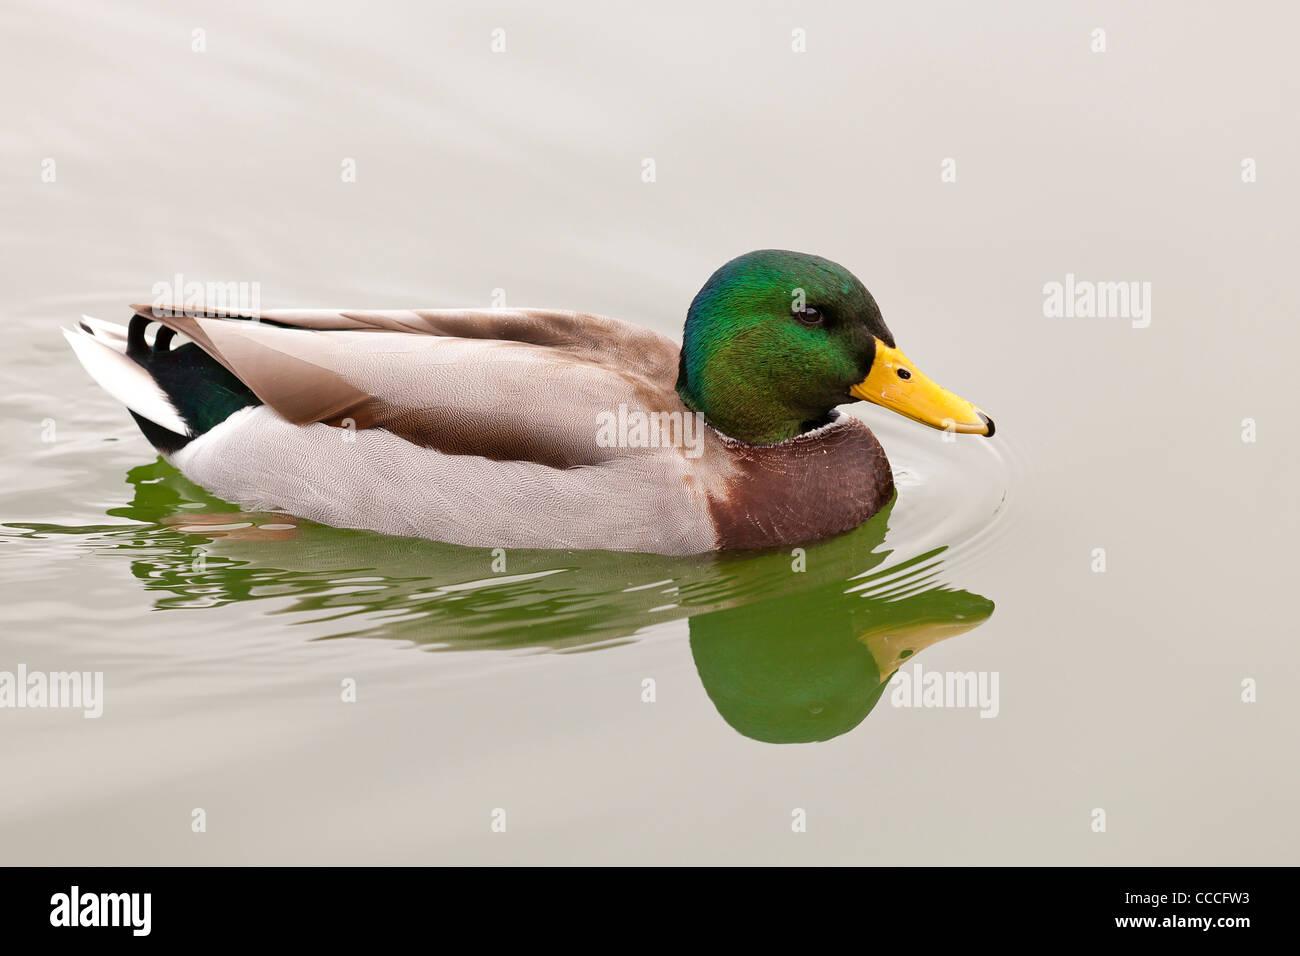 Male Mallard duck on water - Stock Image